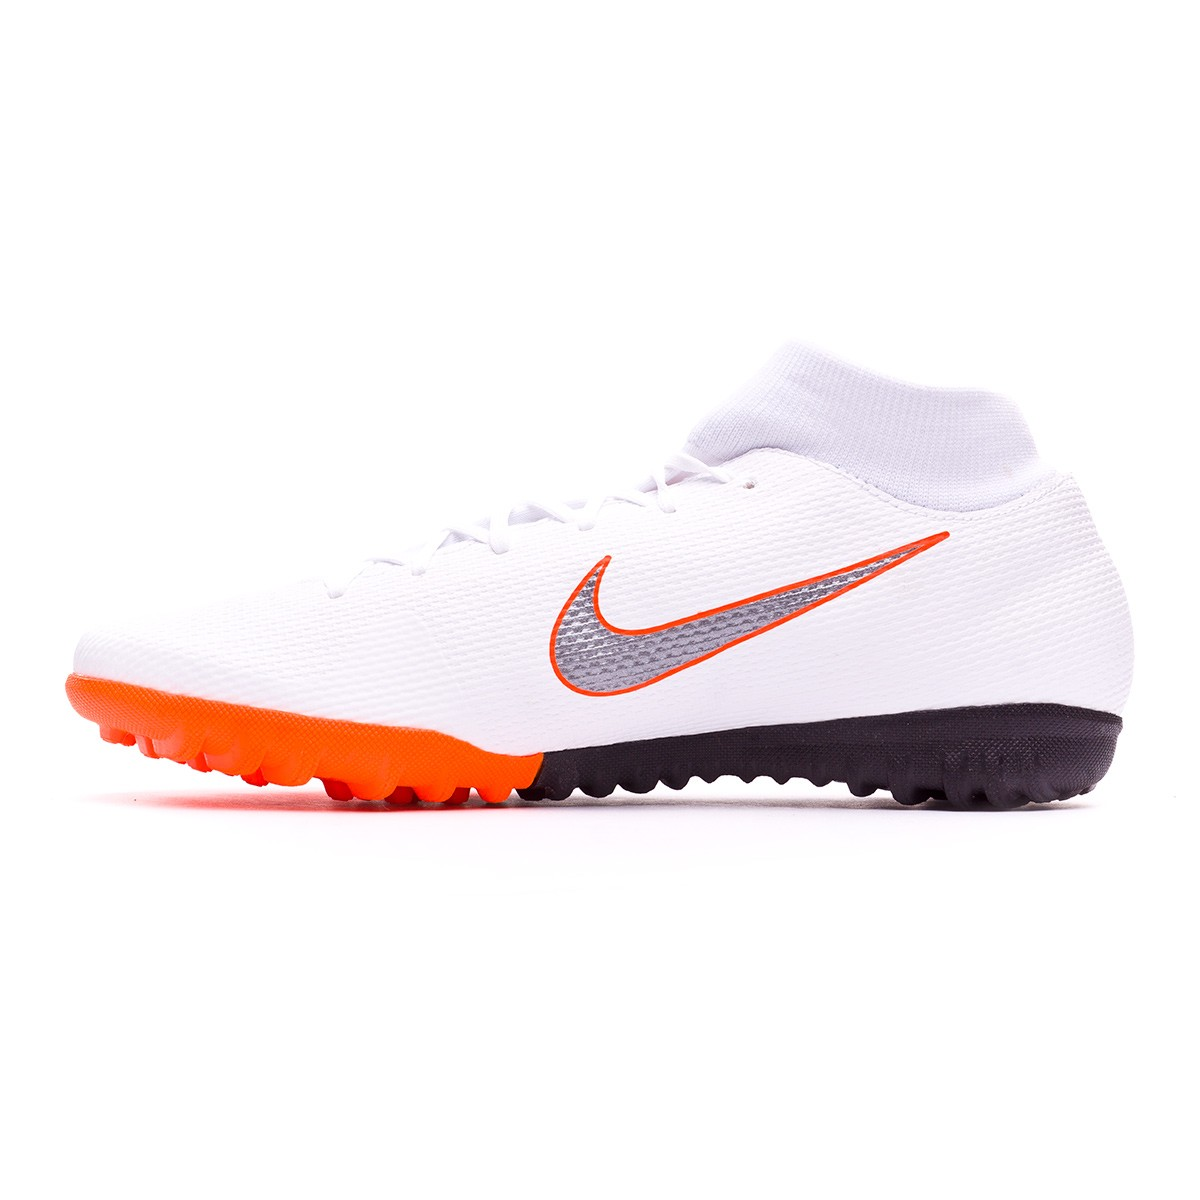 1693802bf5 Tenis Nike Mercurial SuperflyX VI Academy Turf White-Metallic cool  grey-Total orange - Tienda de fútbol Fútbol Emotion